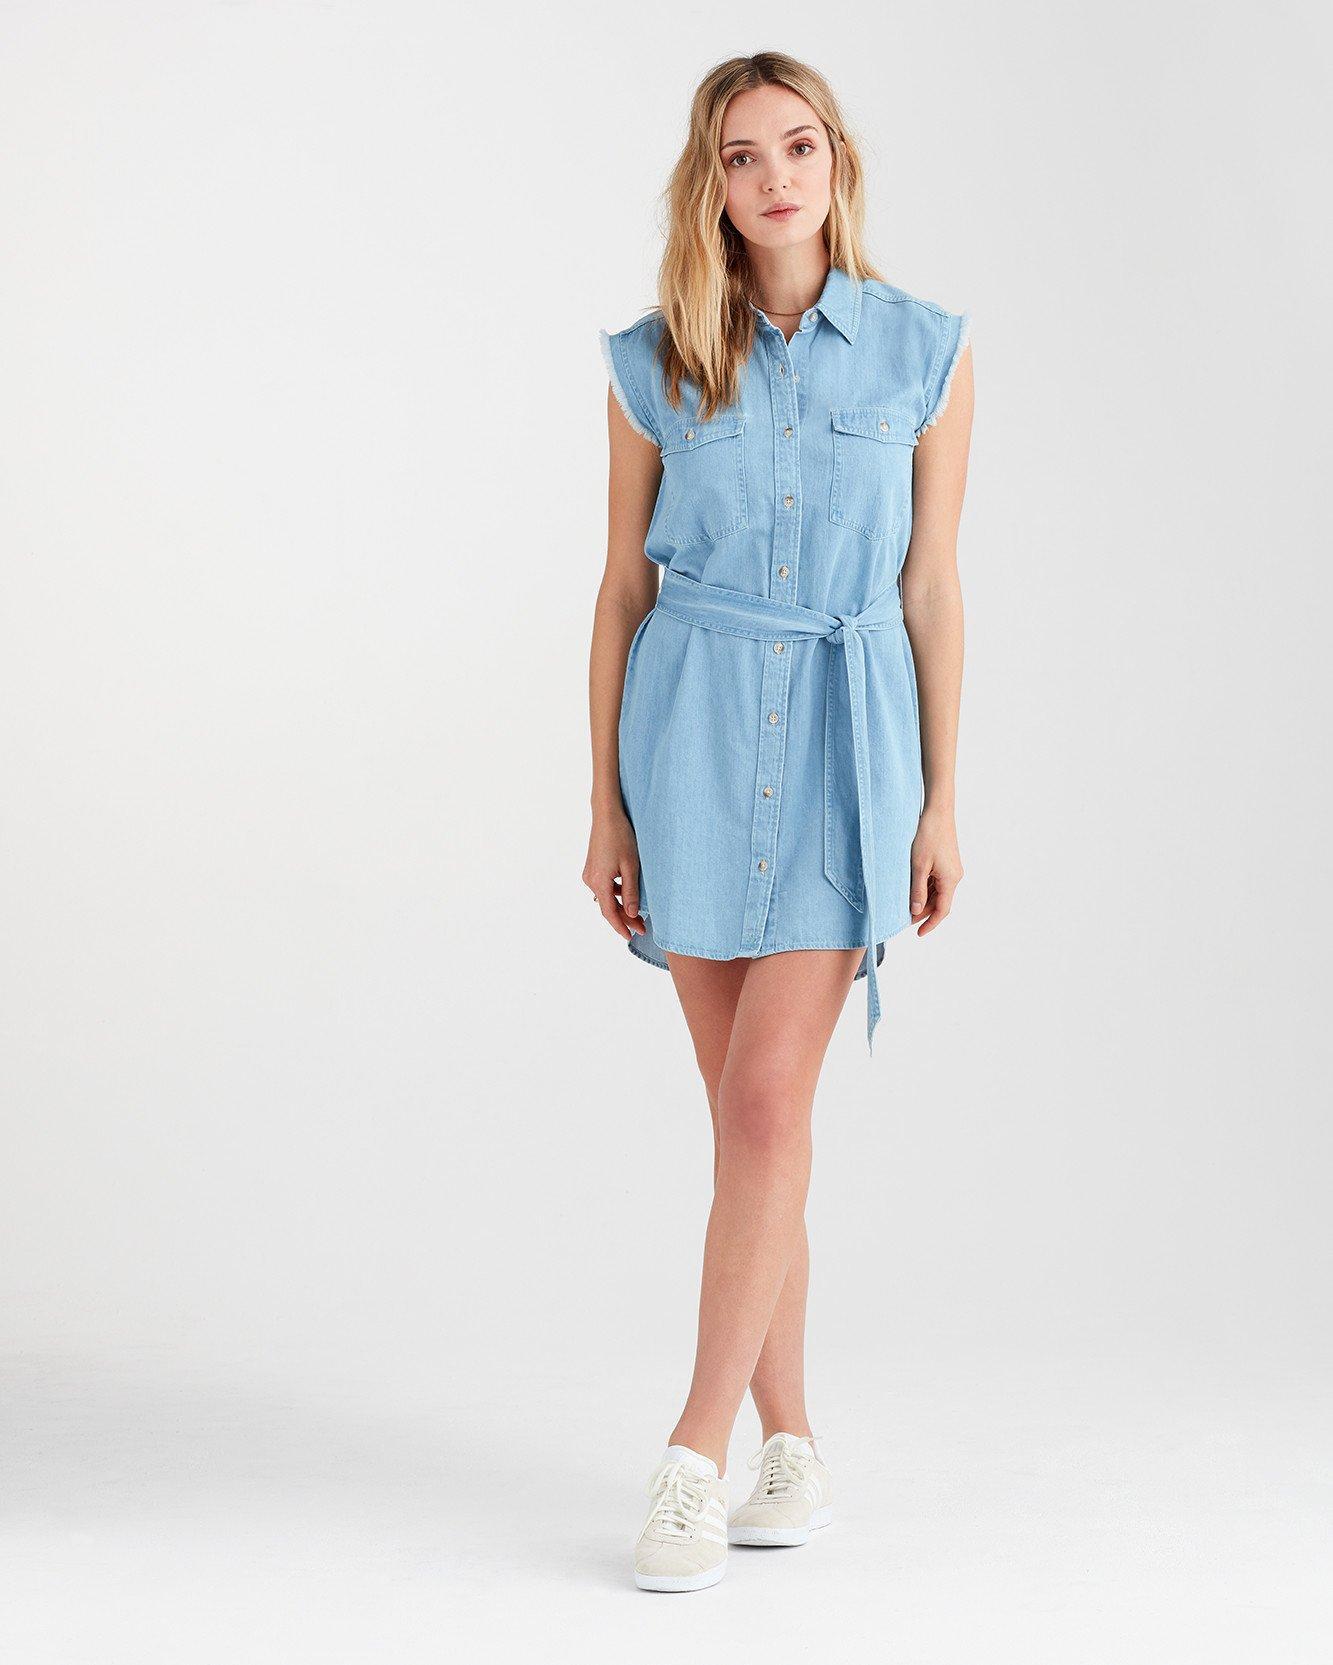 3552cc0a2ab15f Lyst - 7 For All Mankind Cut Off Sleeve Shirt Dress In Soft Blue ...